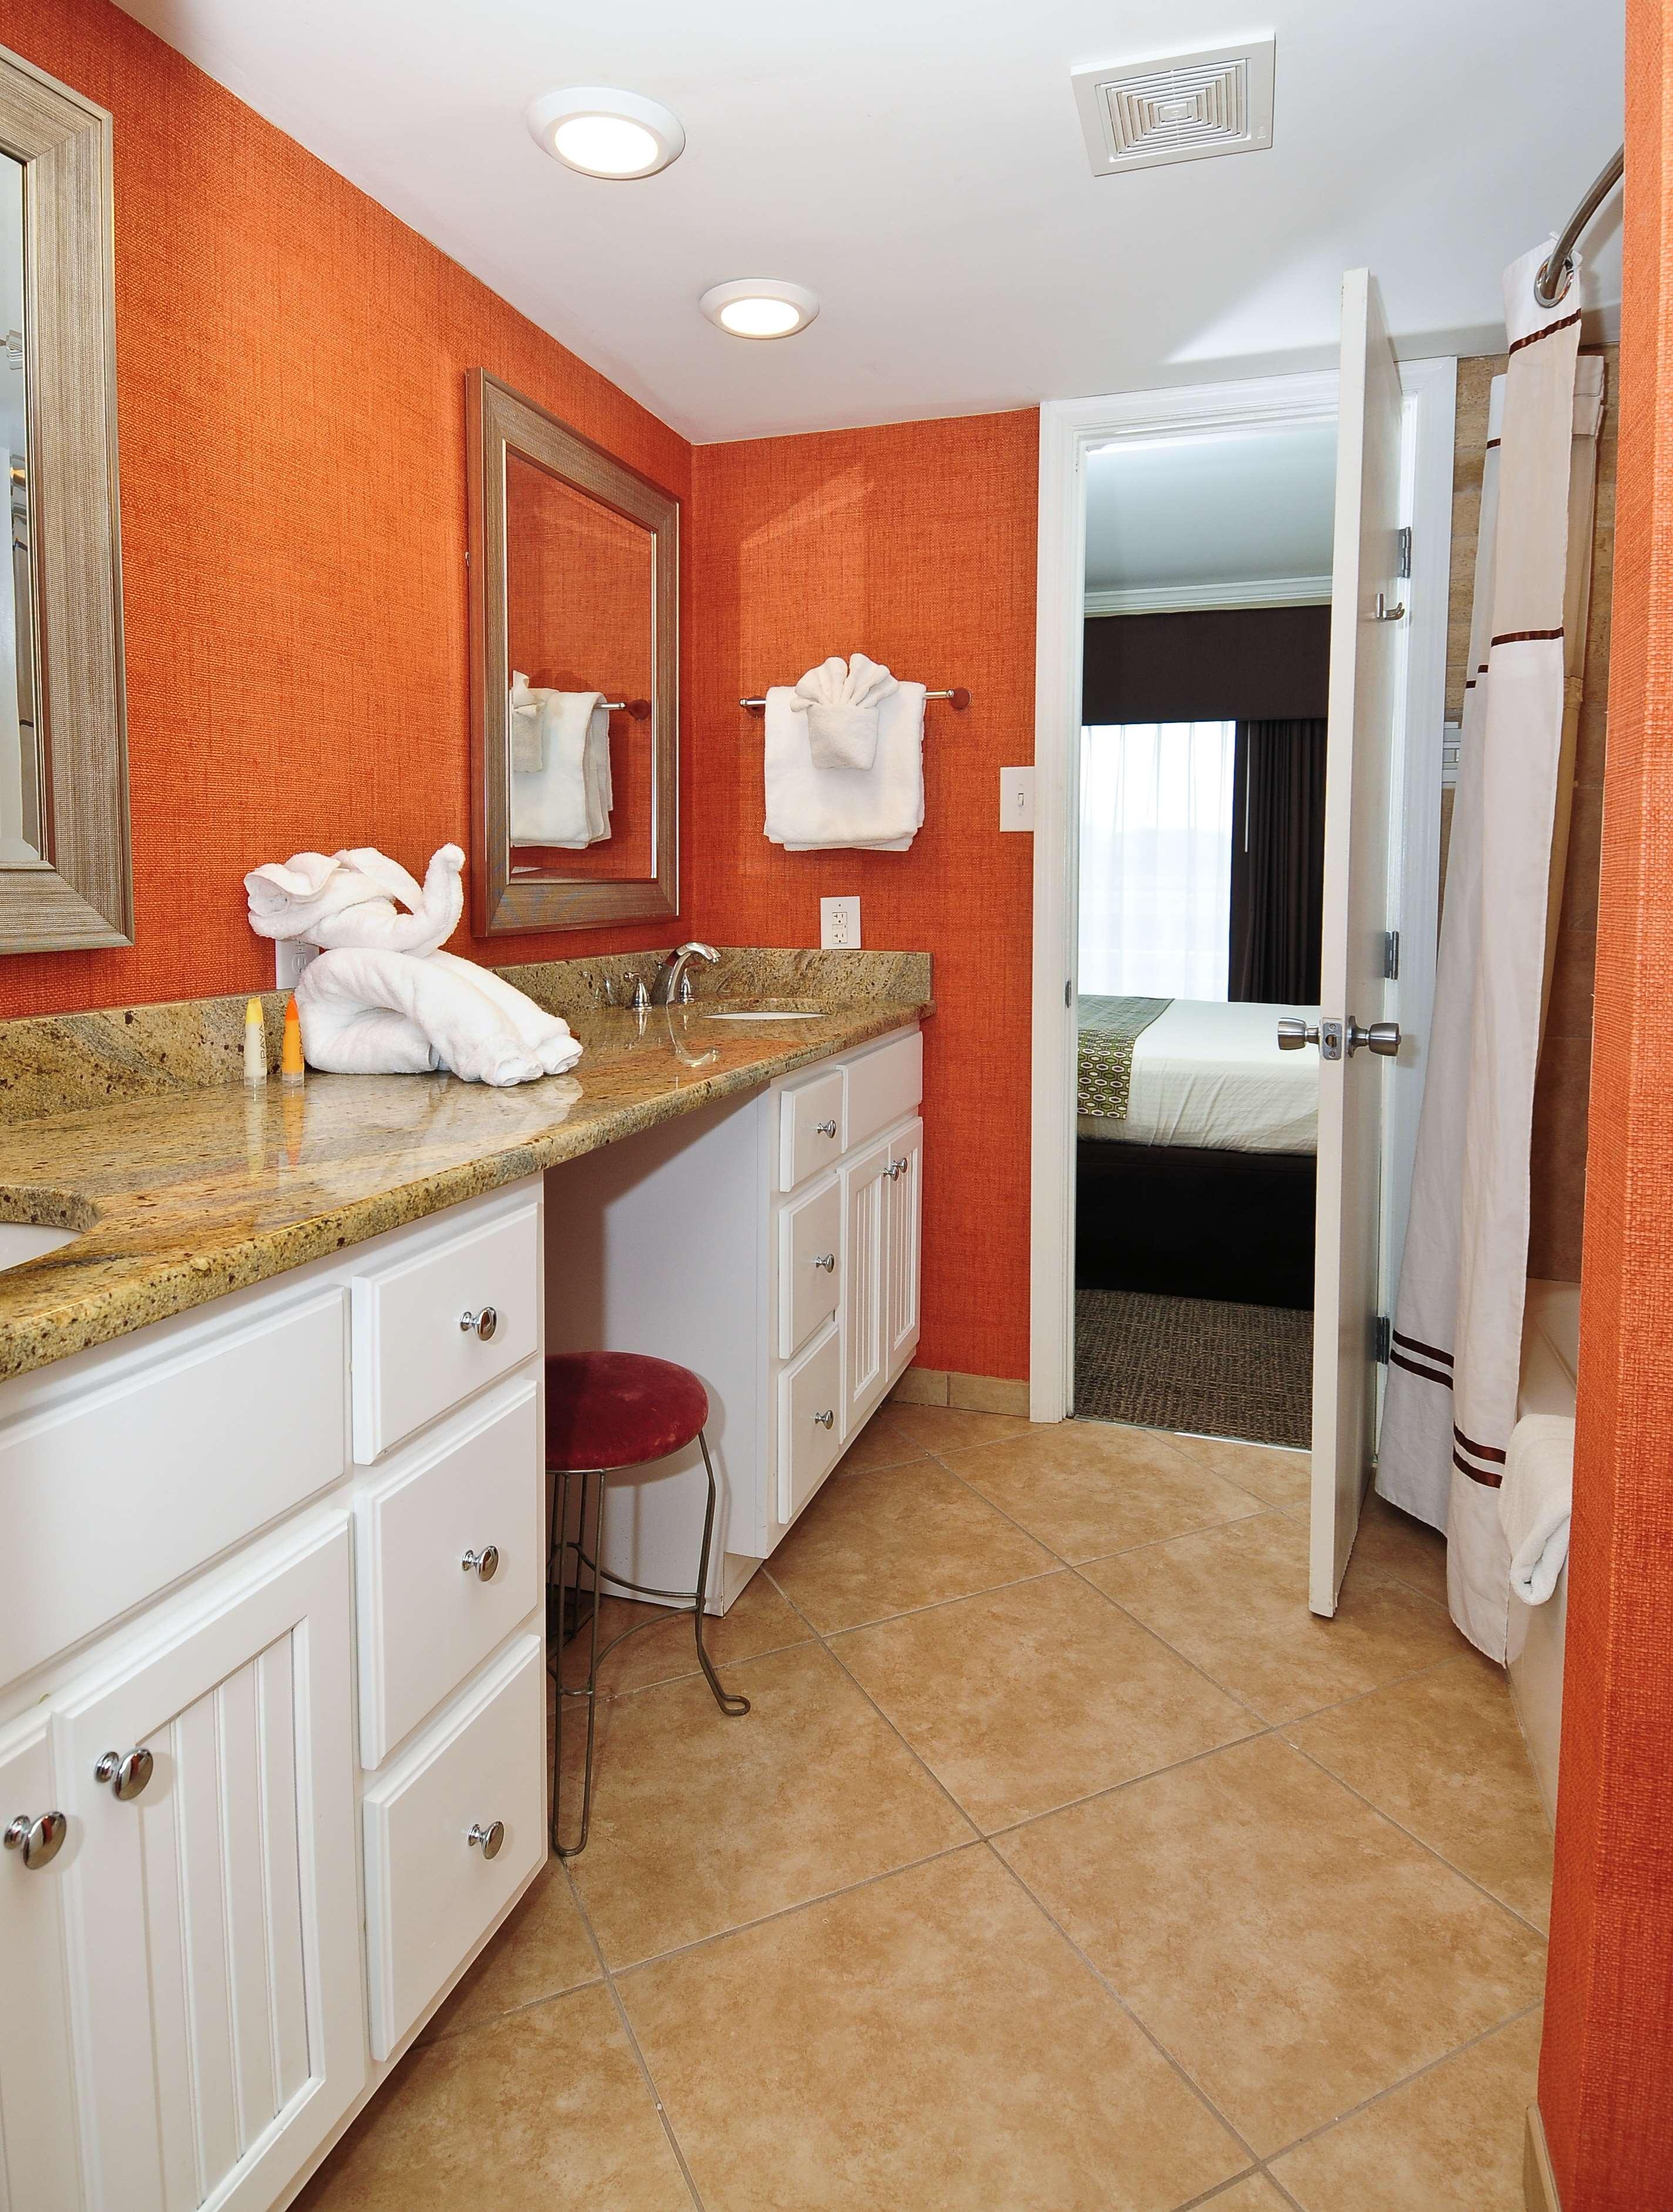 Best Western Plus Grand Strand Inn & Suites image 22